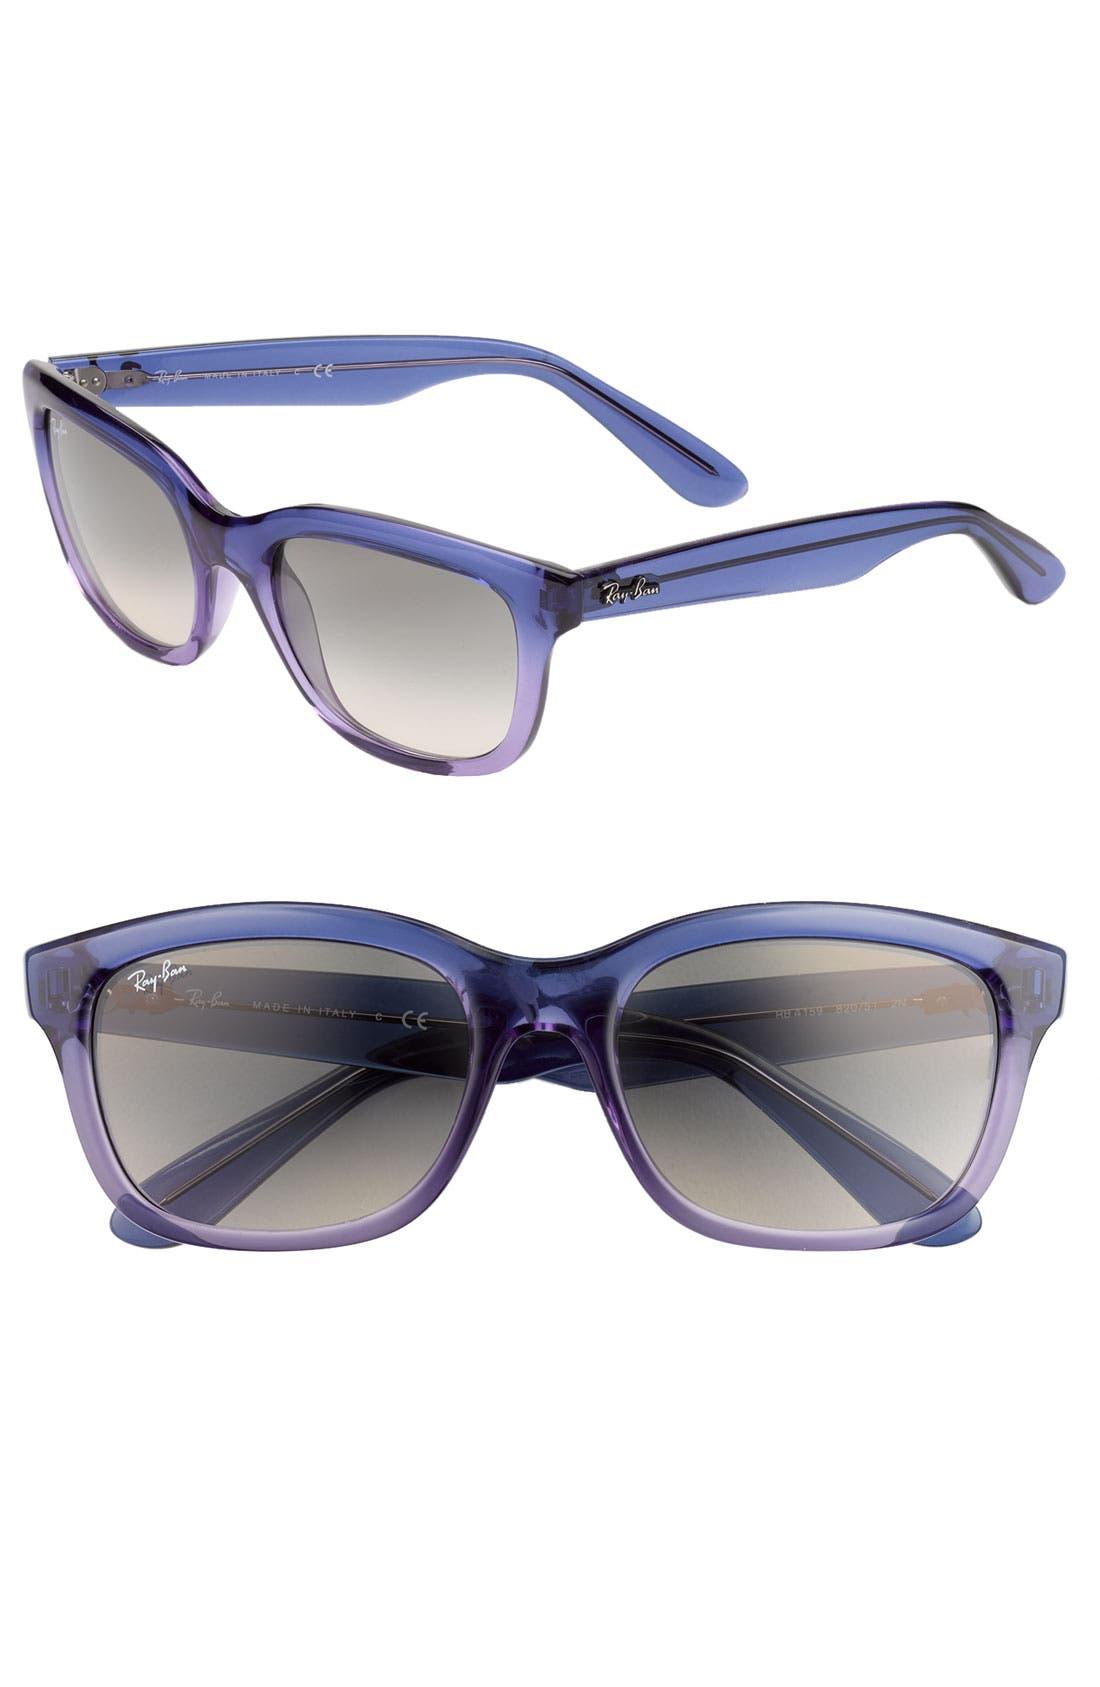 Alternate Image 1 Selected - Ray-Ban 'Updated Wayfarer' 54mm Sunglasses